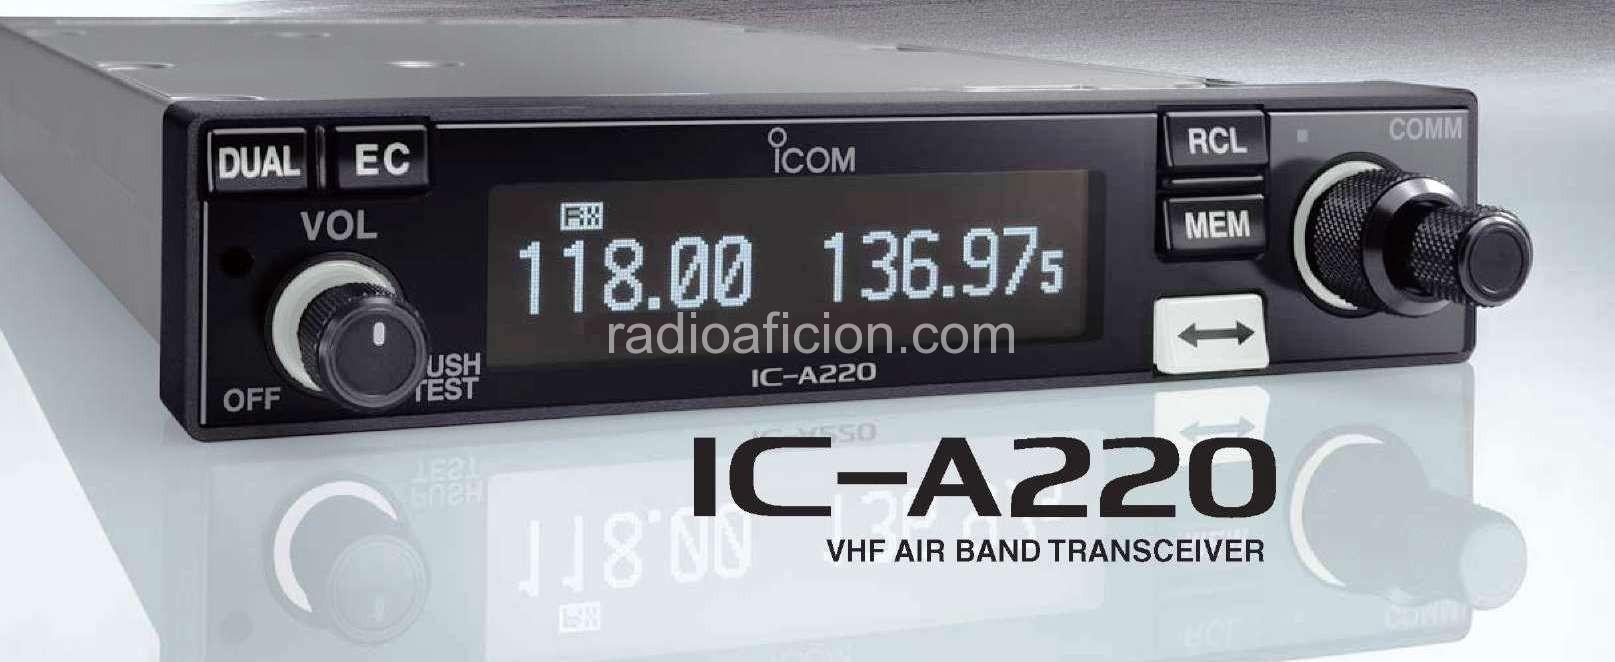 IC-A220-1.jpg